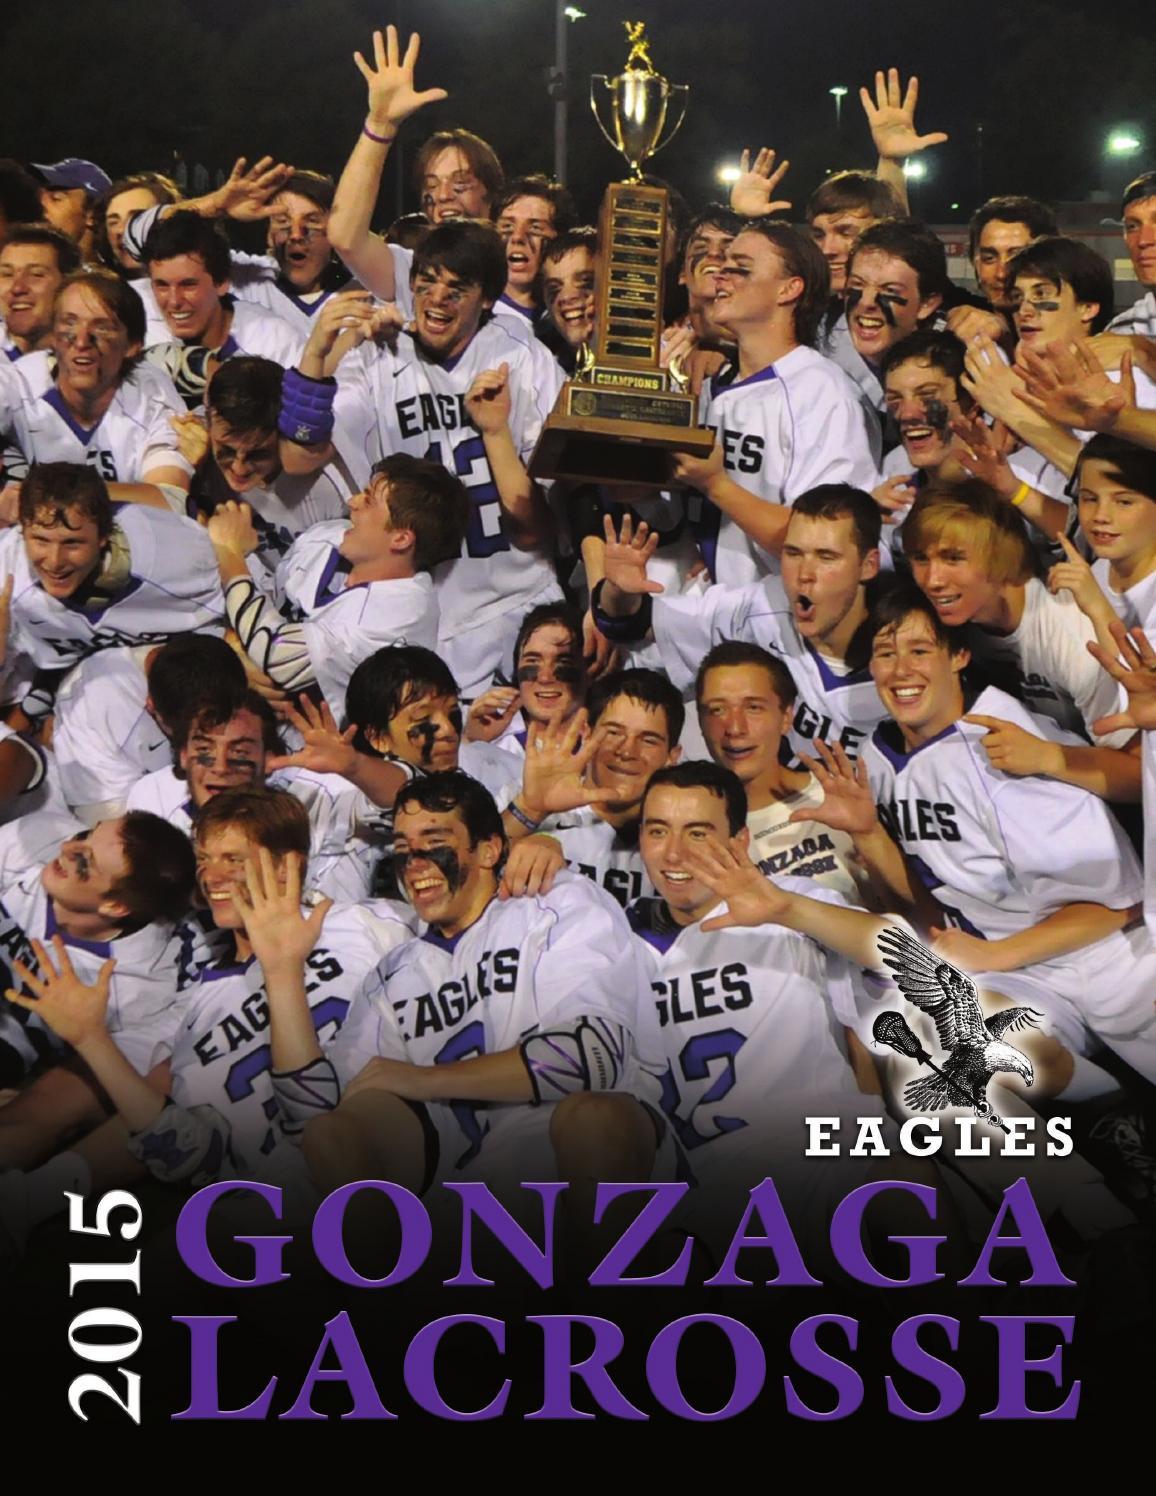 Lacrosse 2015 Media Guide By Gonzaga College High School